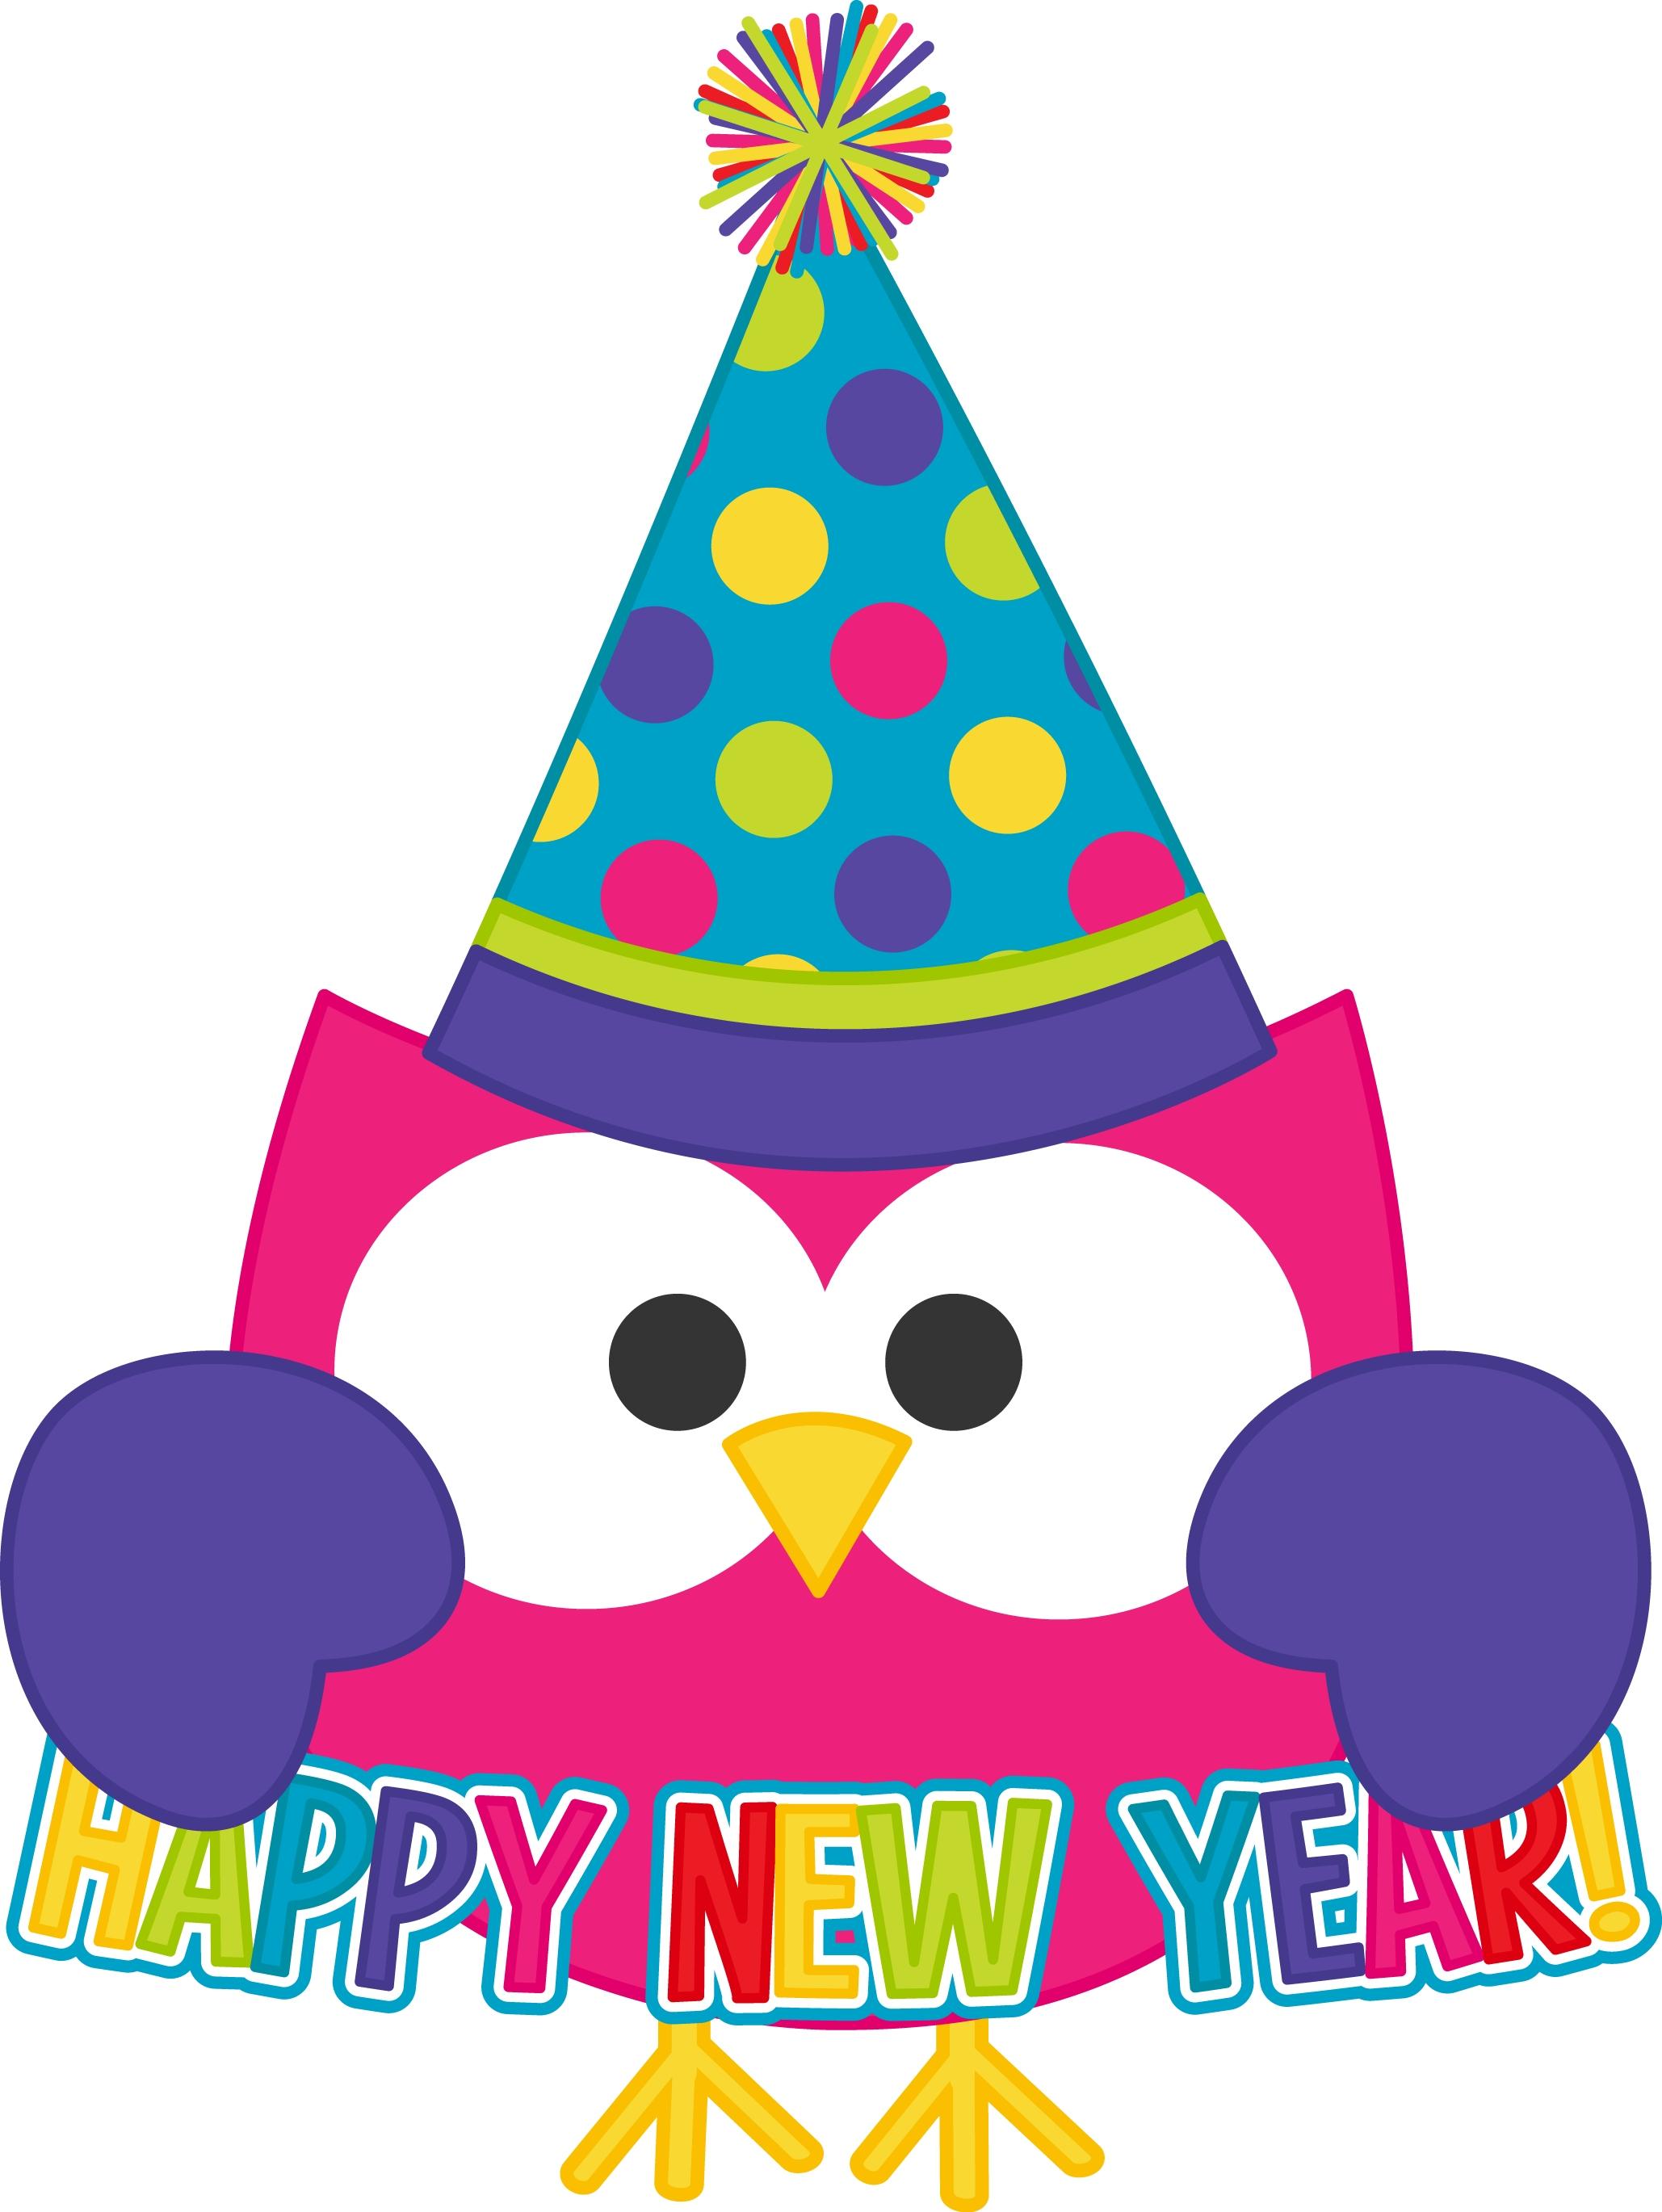 Happy New Year 2017 Free Cute .-Happy New Year 2017 Free Cute .-7